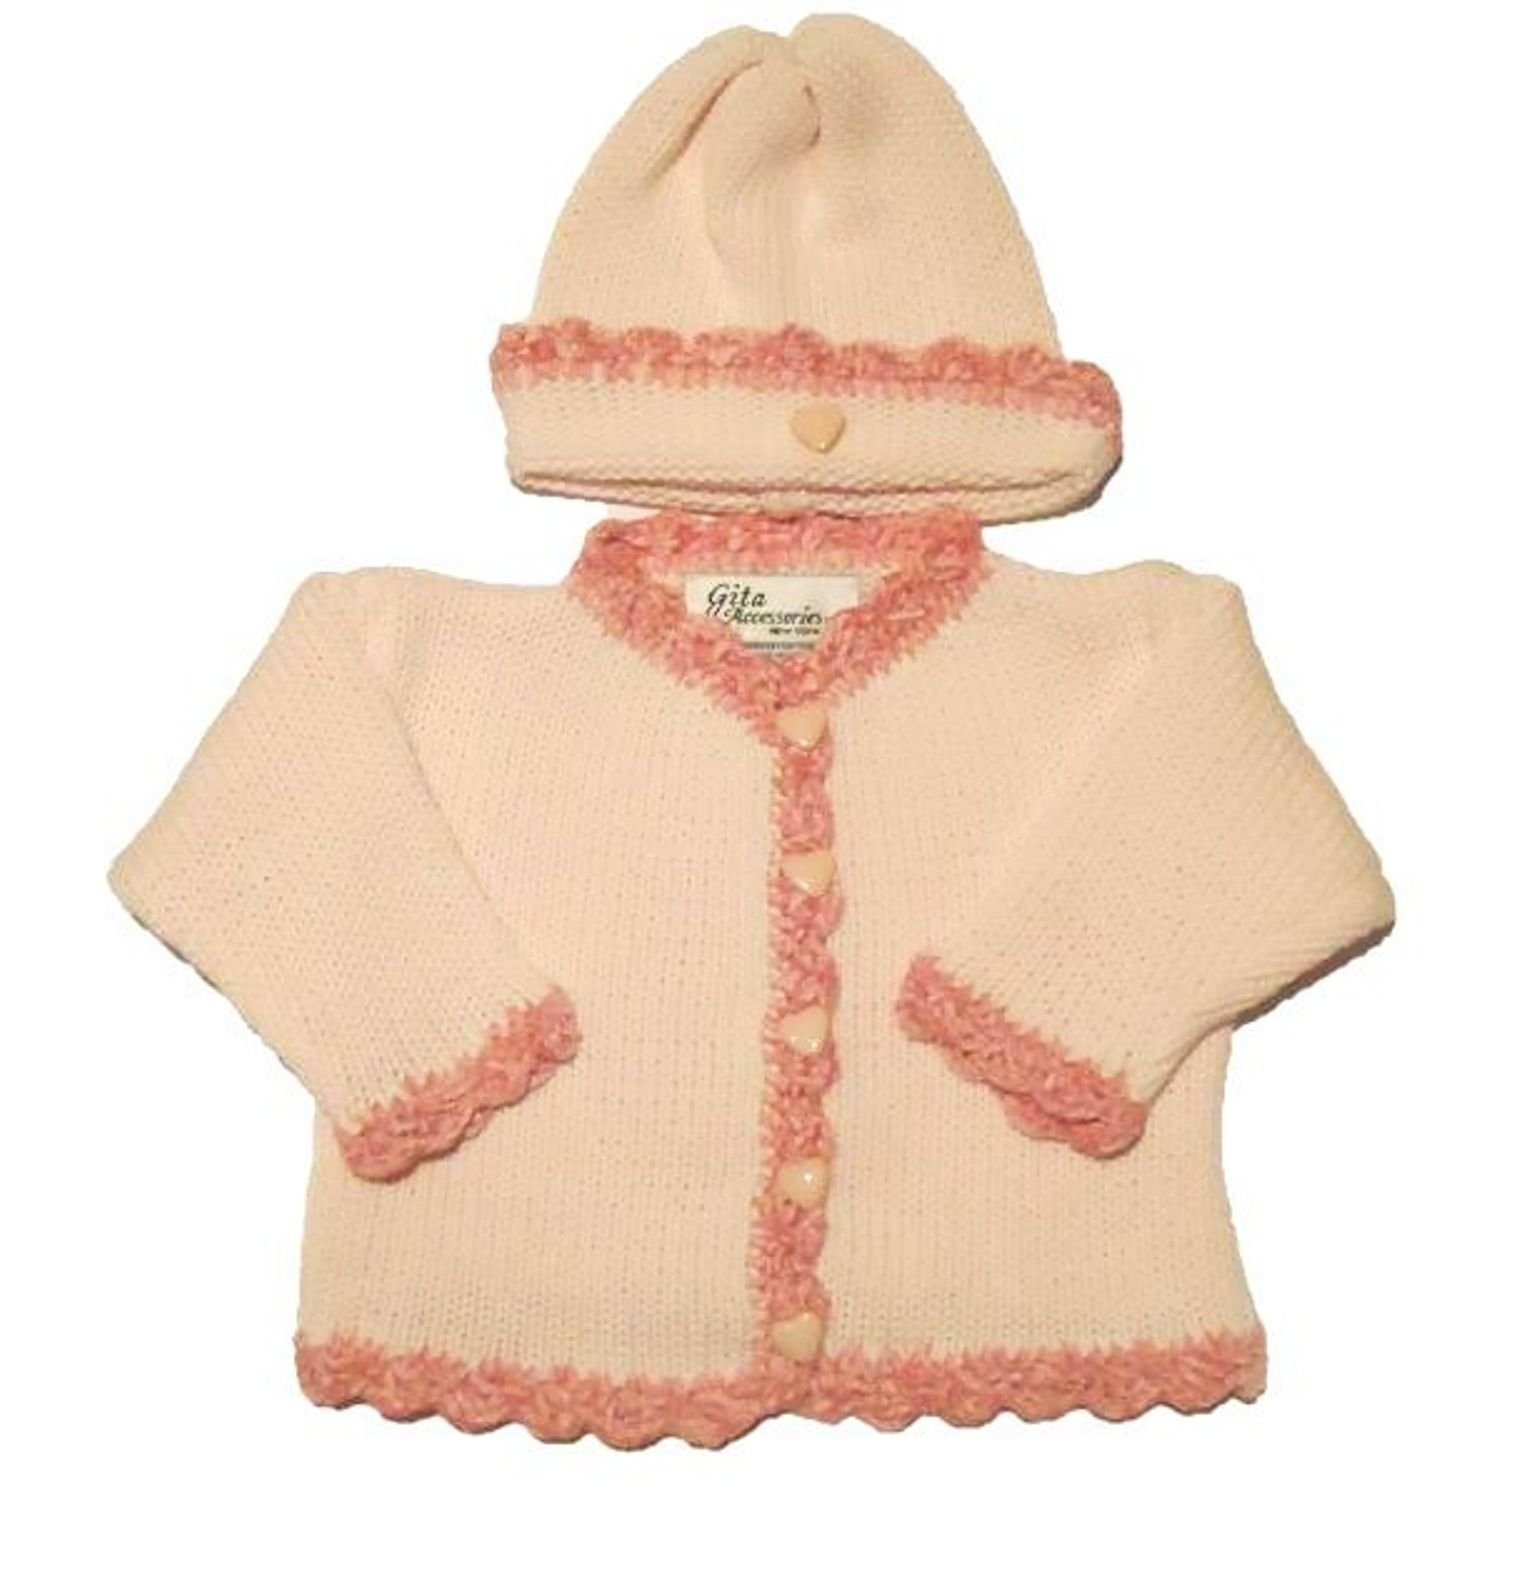 Knitted Crochet Pink Cotton Raspberry Chenille Trim Cardigan Hat Set 6-12 Mnths by Sanjit